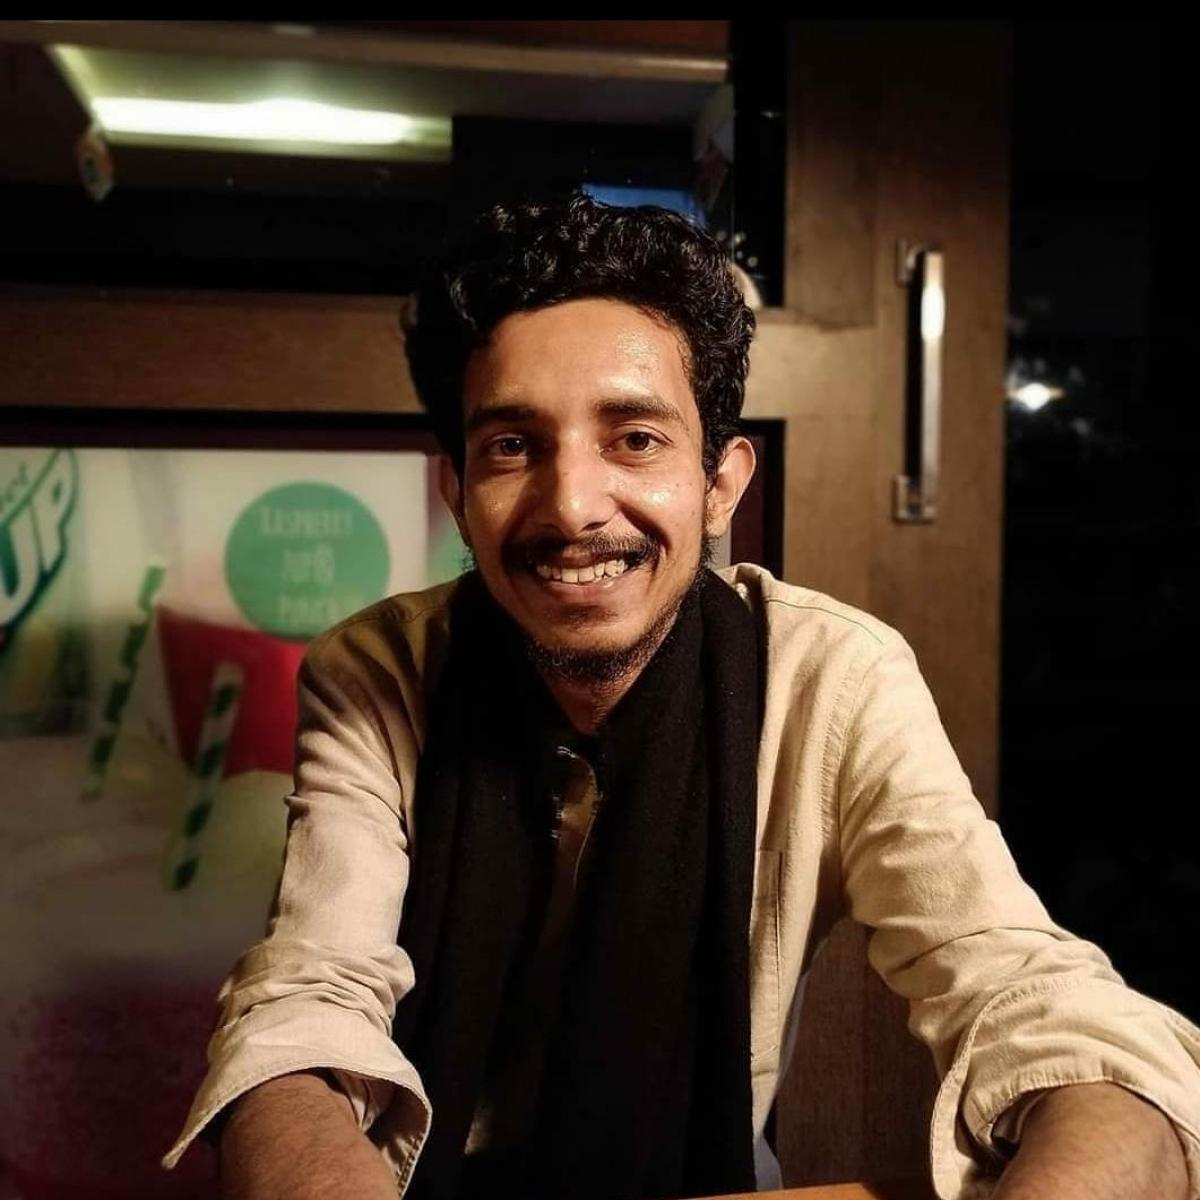 Bhima-Koregaon Violence: Sharjeel Usmani moves HC against FIR for hate speech